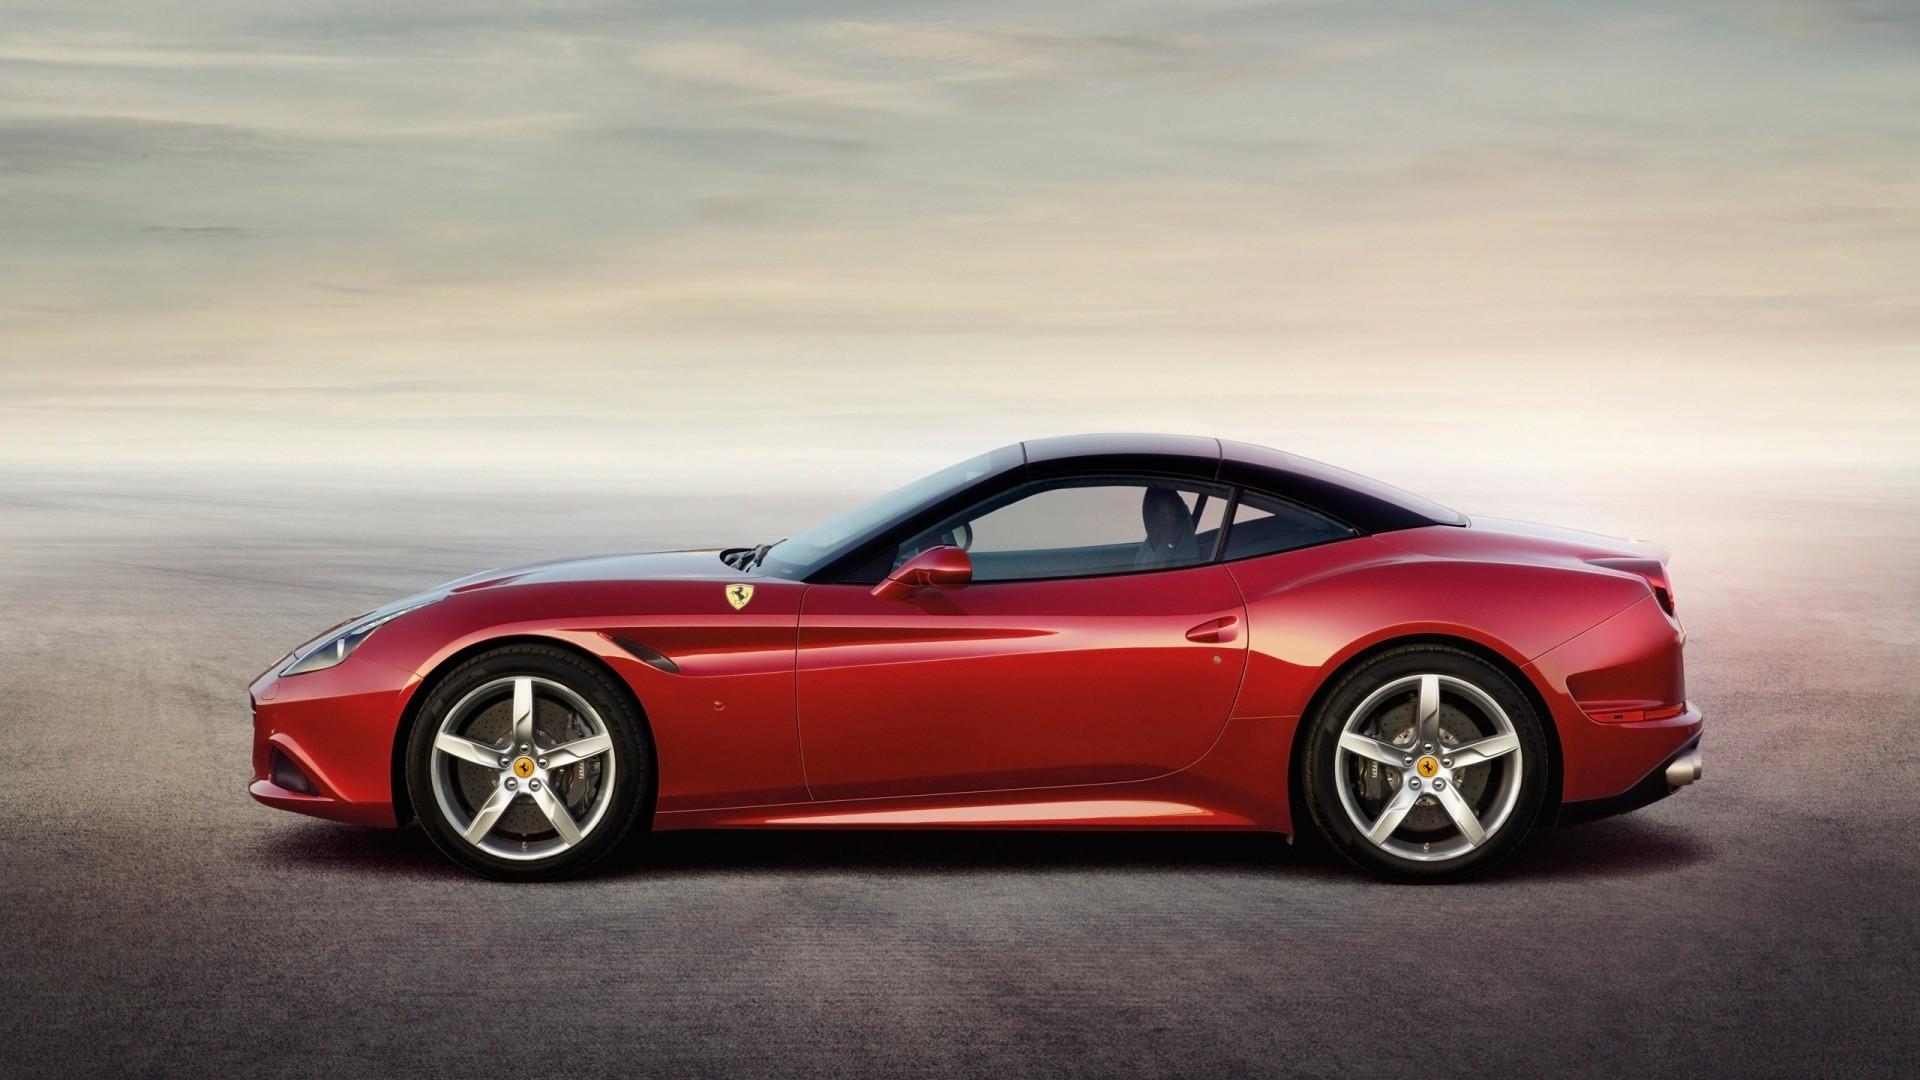 2014 Ferrari California T 6 Wallpaper | HD Car Wallpapers ...